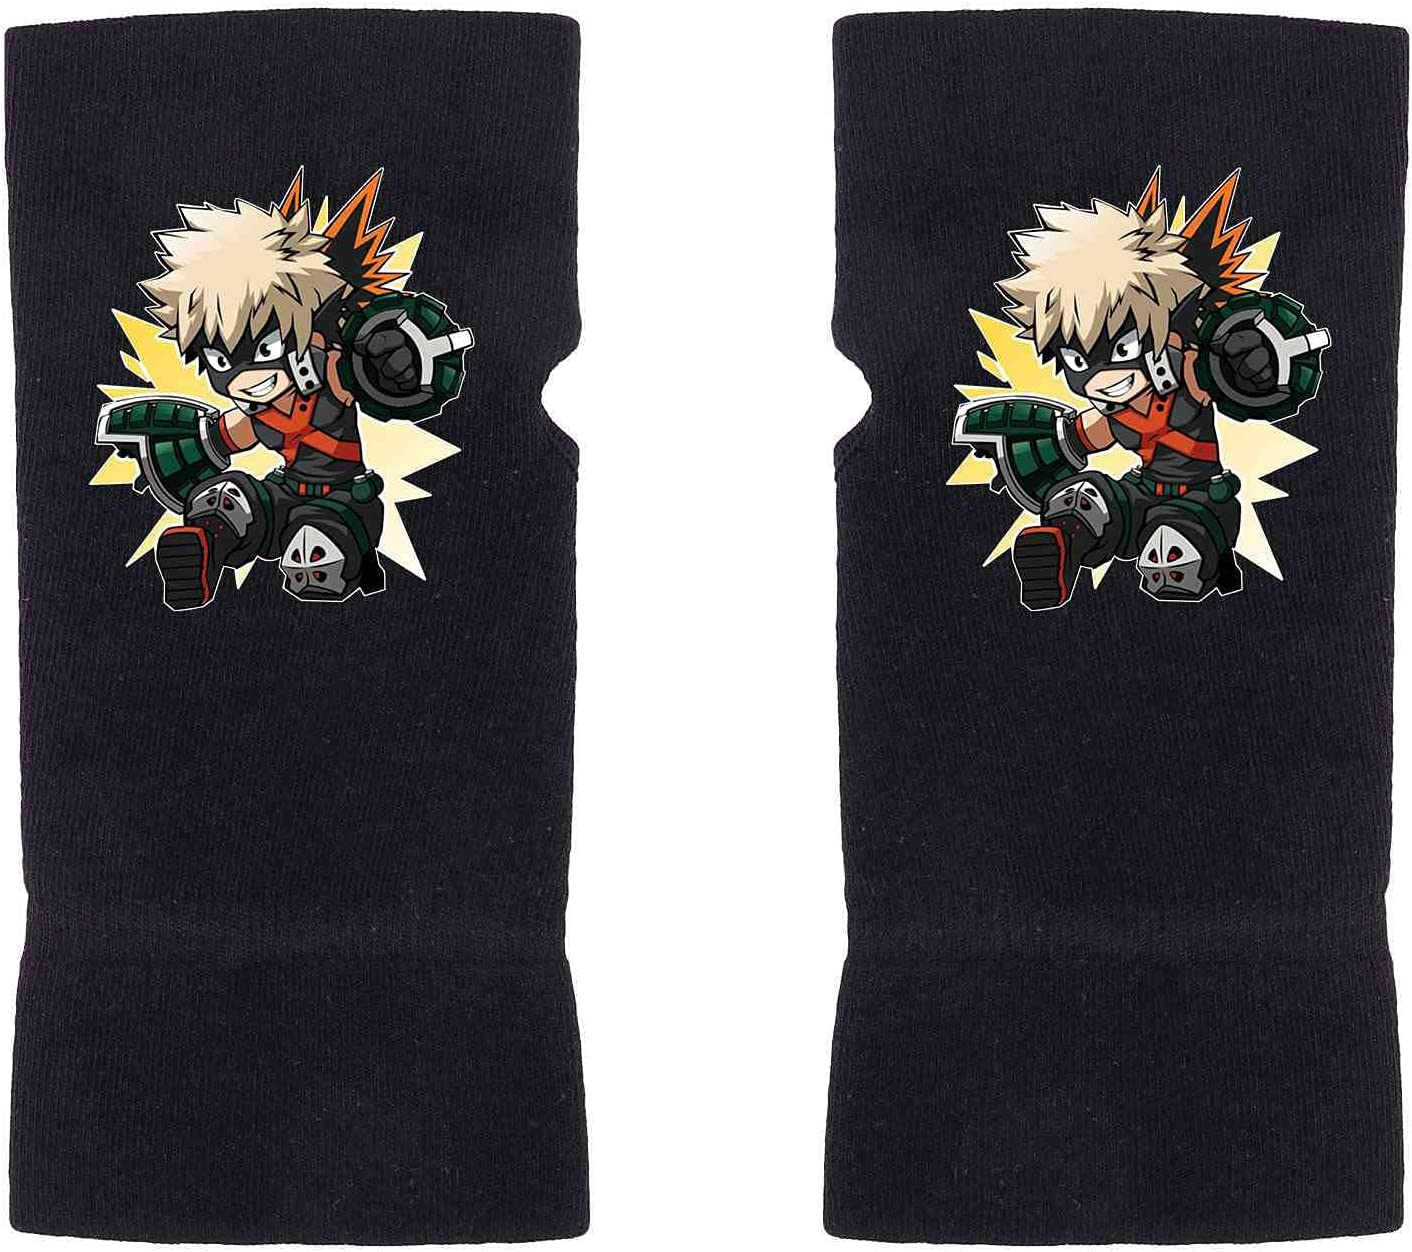 GBaoY My Hero Academia Fingerless Gloves Deku MHA Anime Mittens Winter Knitting Gloves